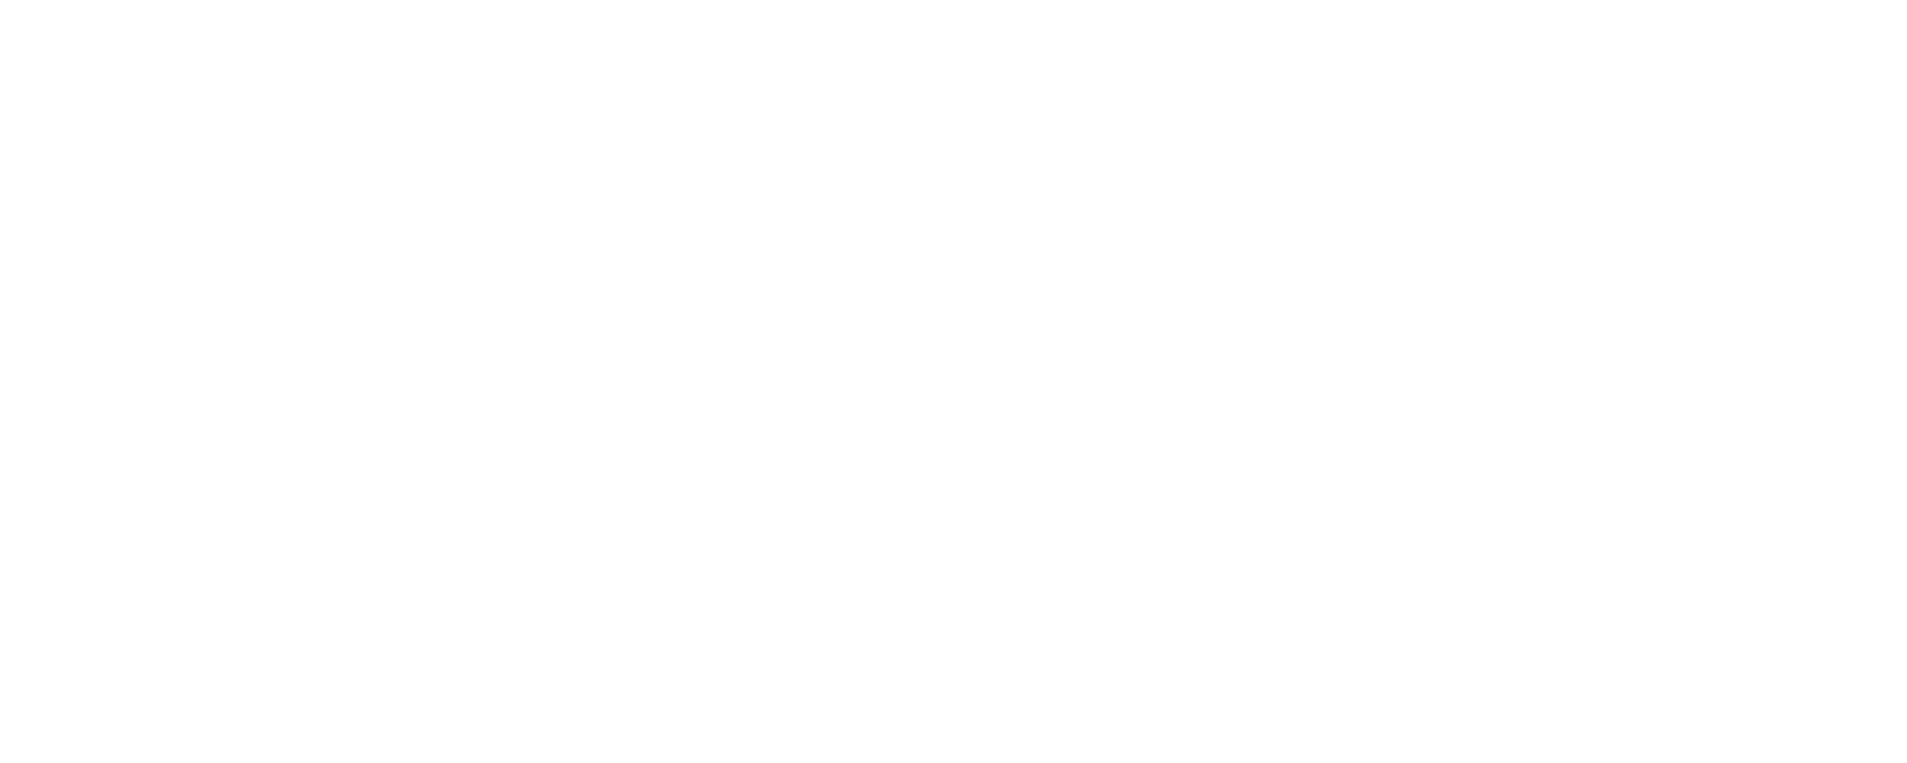 Customer Satisfaction Survey | Web & Phone Surveys | SERVICE 800